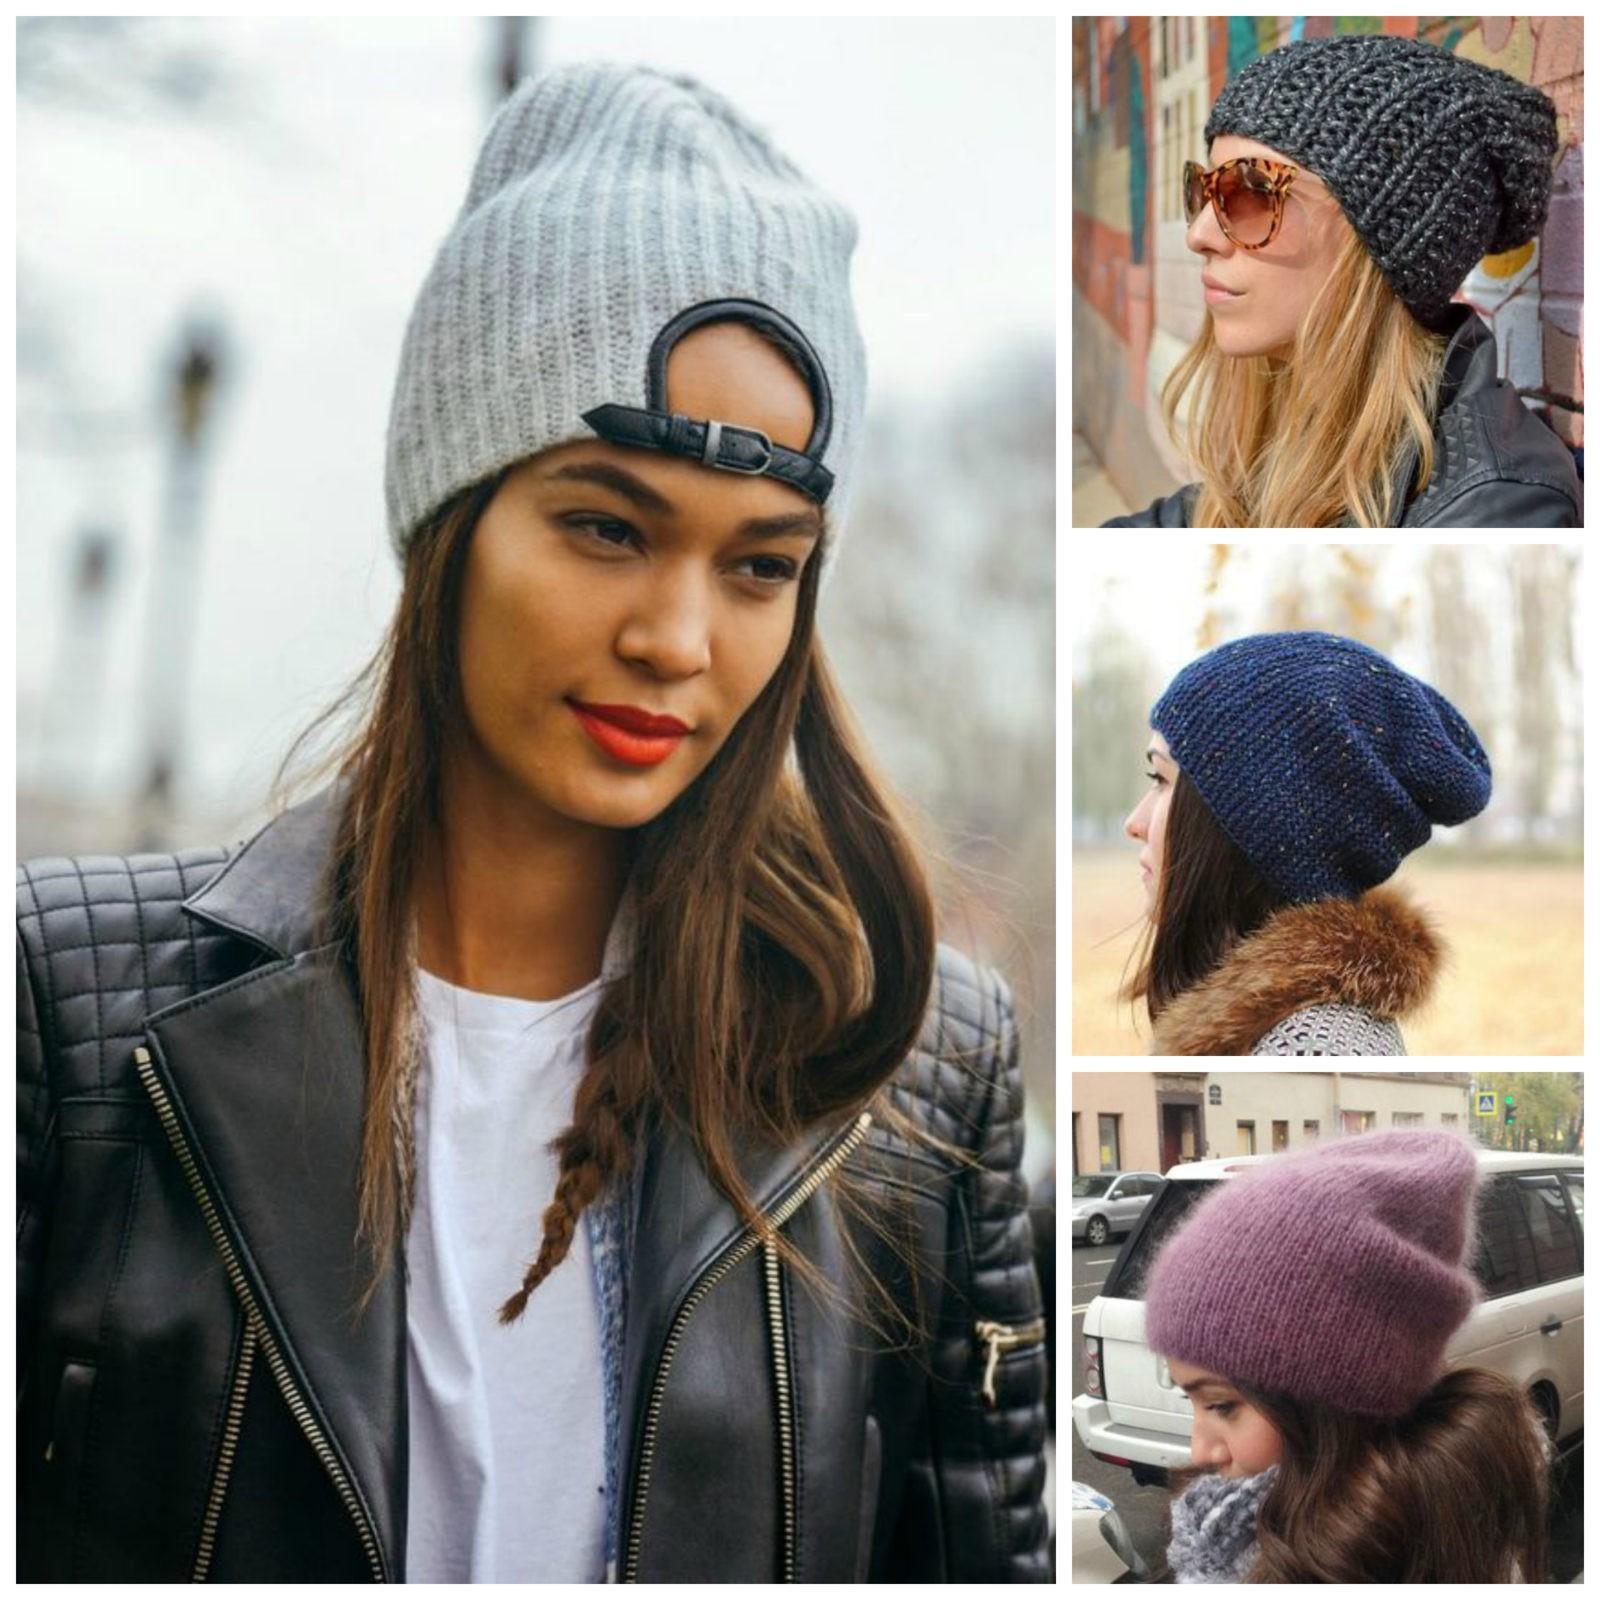 Какие шапки будут в моде зимой 2018-2018 фото цена